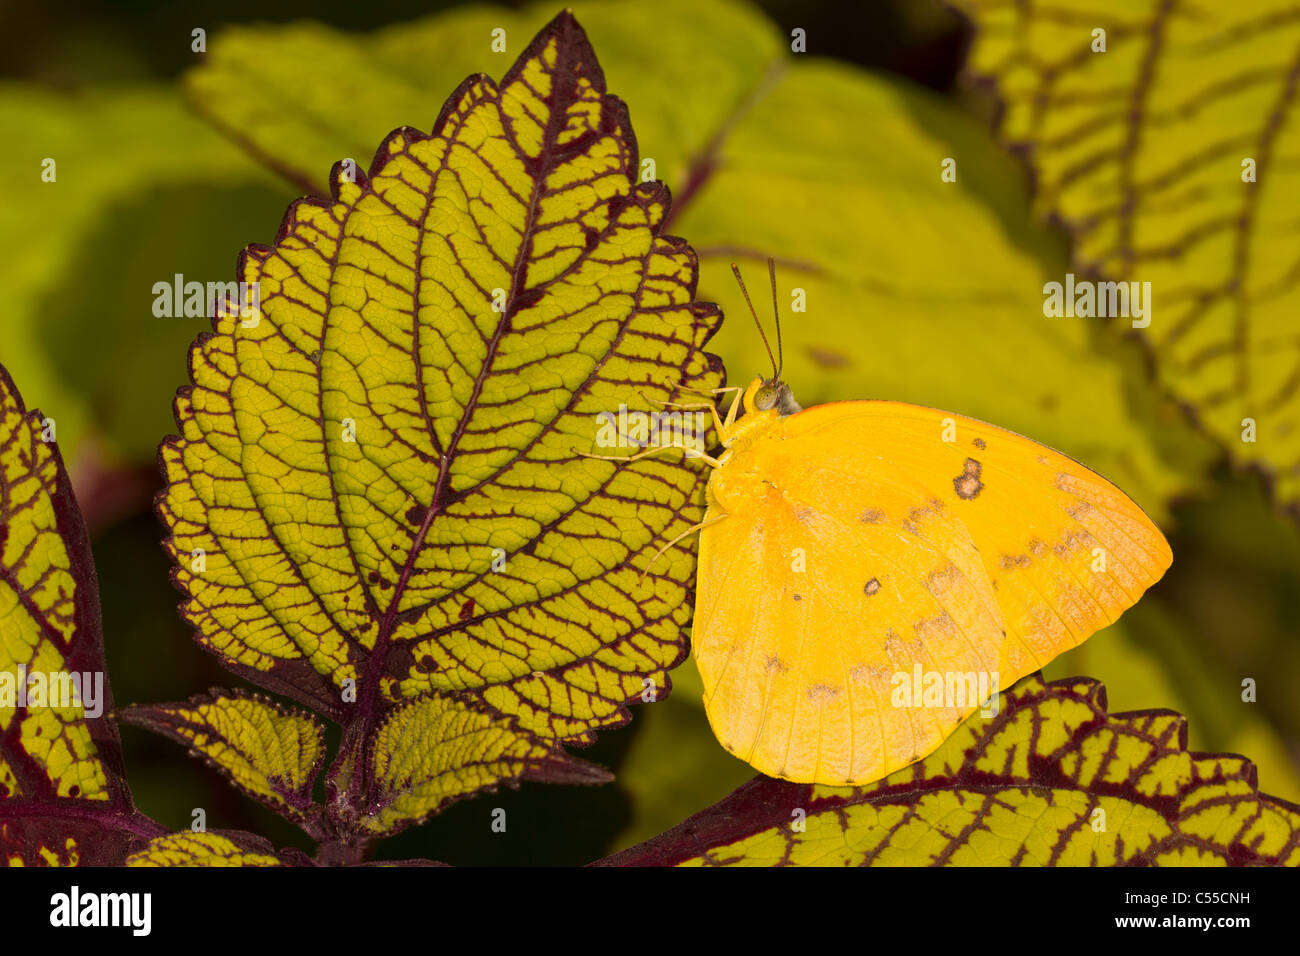 Ornage Emigrant Butterfly (Catopsilia scylla) - Stock Image